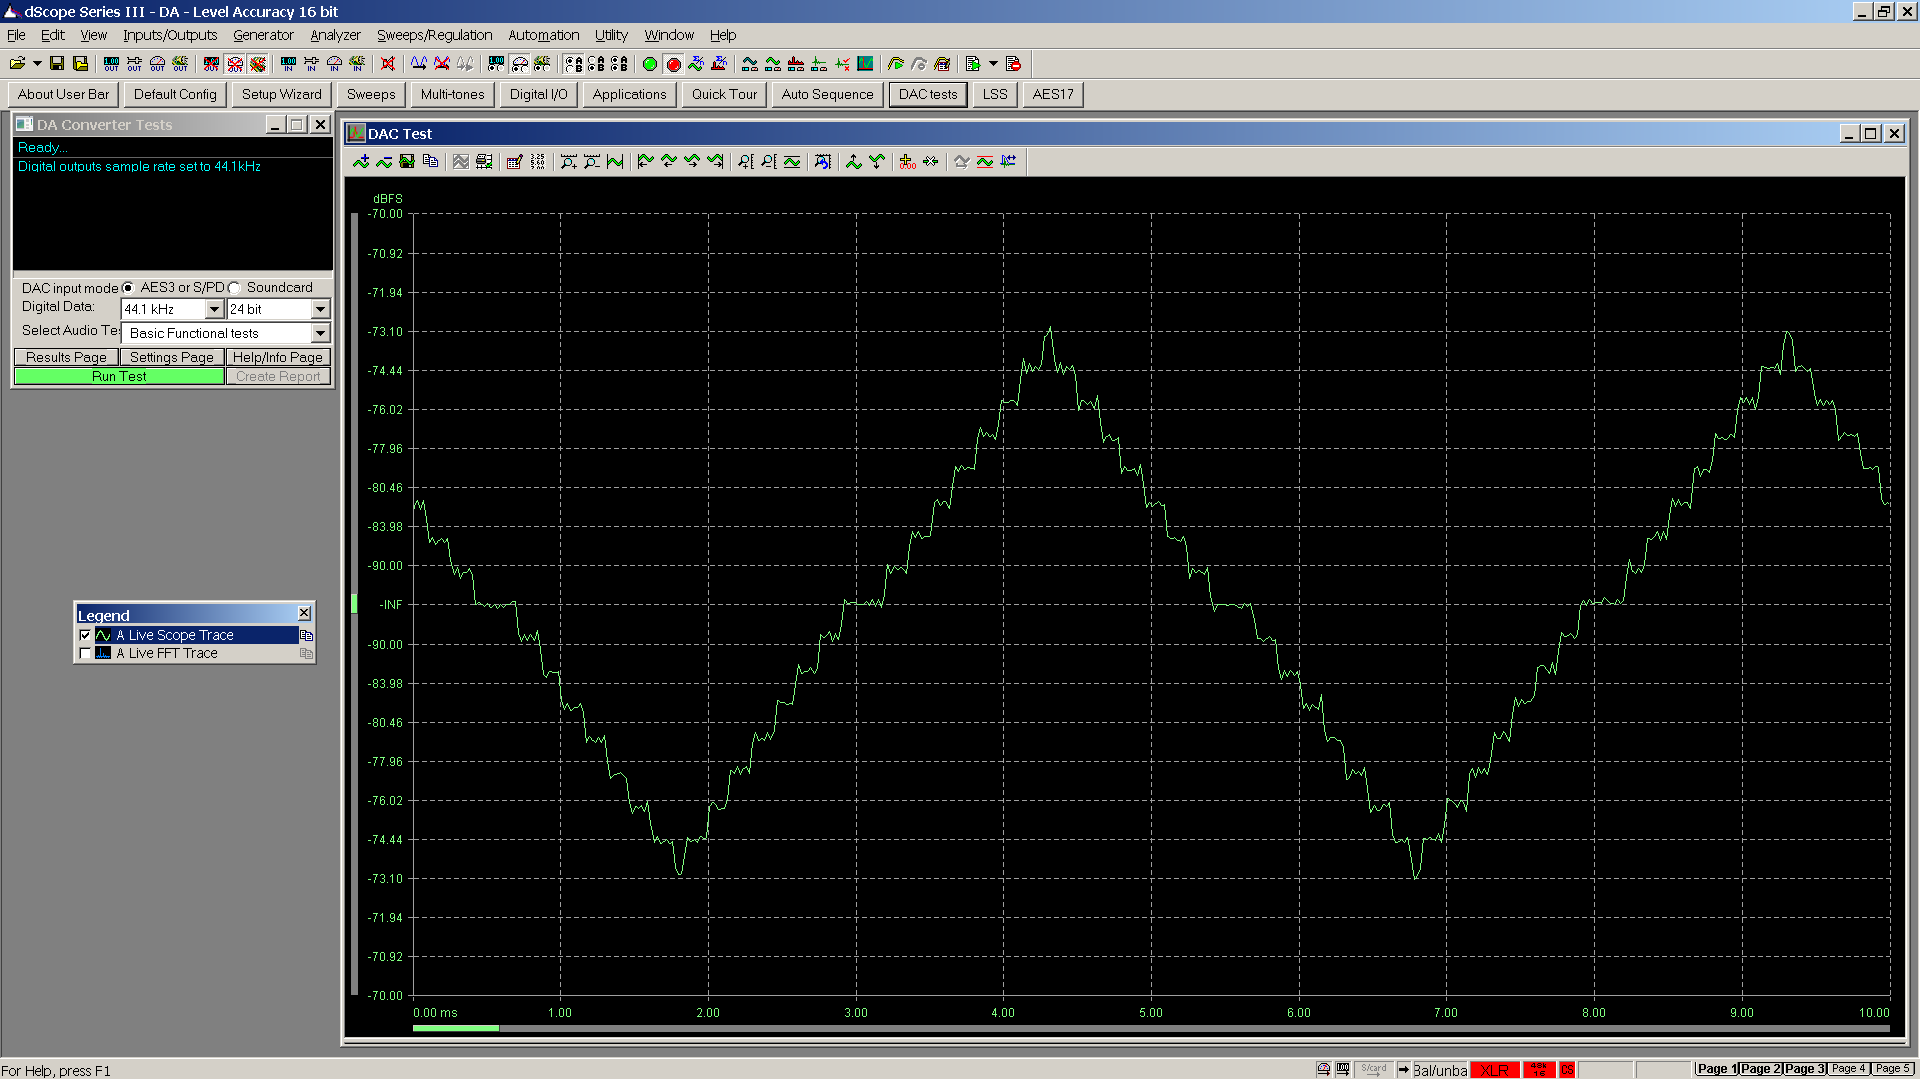 20170404 Concero HD triangle 200 Hz  -72 dBFS level acc - 16 bit pad 24 CEP - bit perfect.png